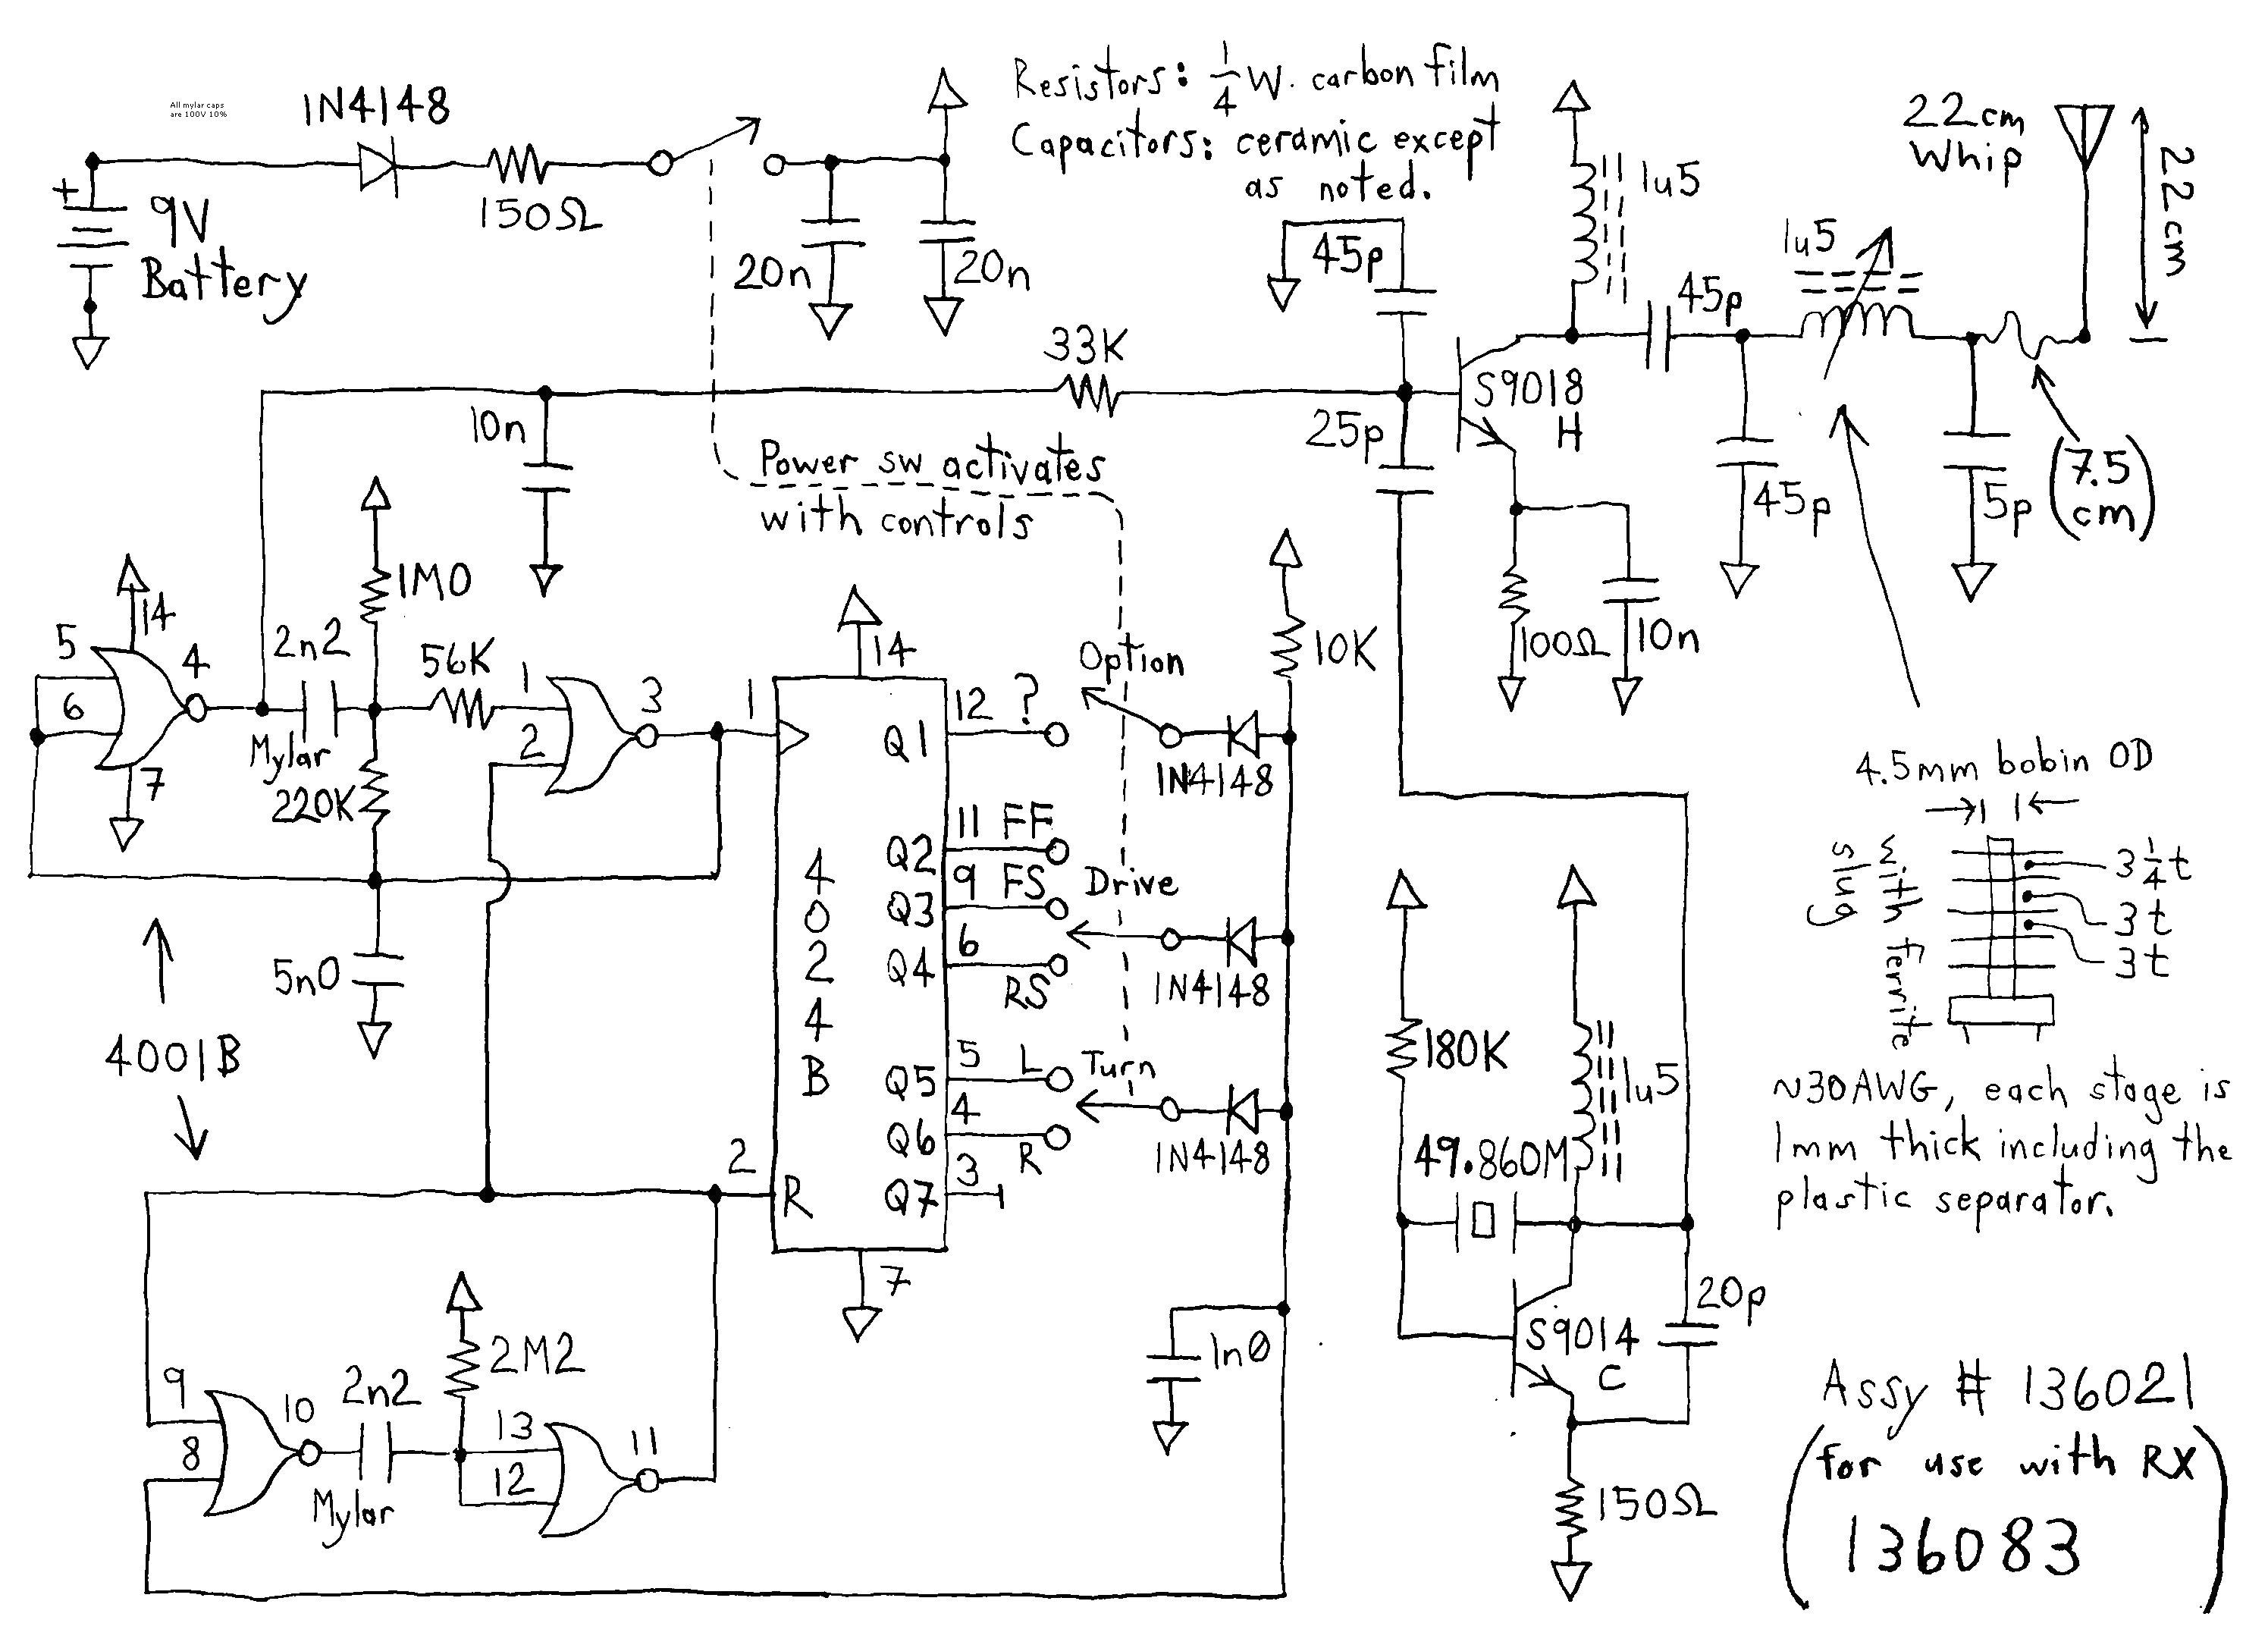 iec motor wiring diagram wiring diagram list iec motor leads wiring diagram